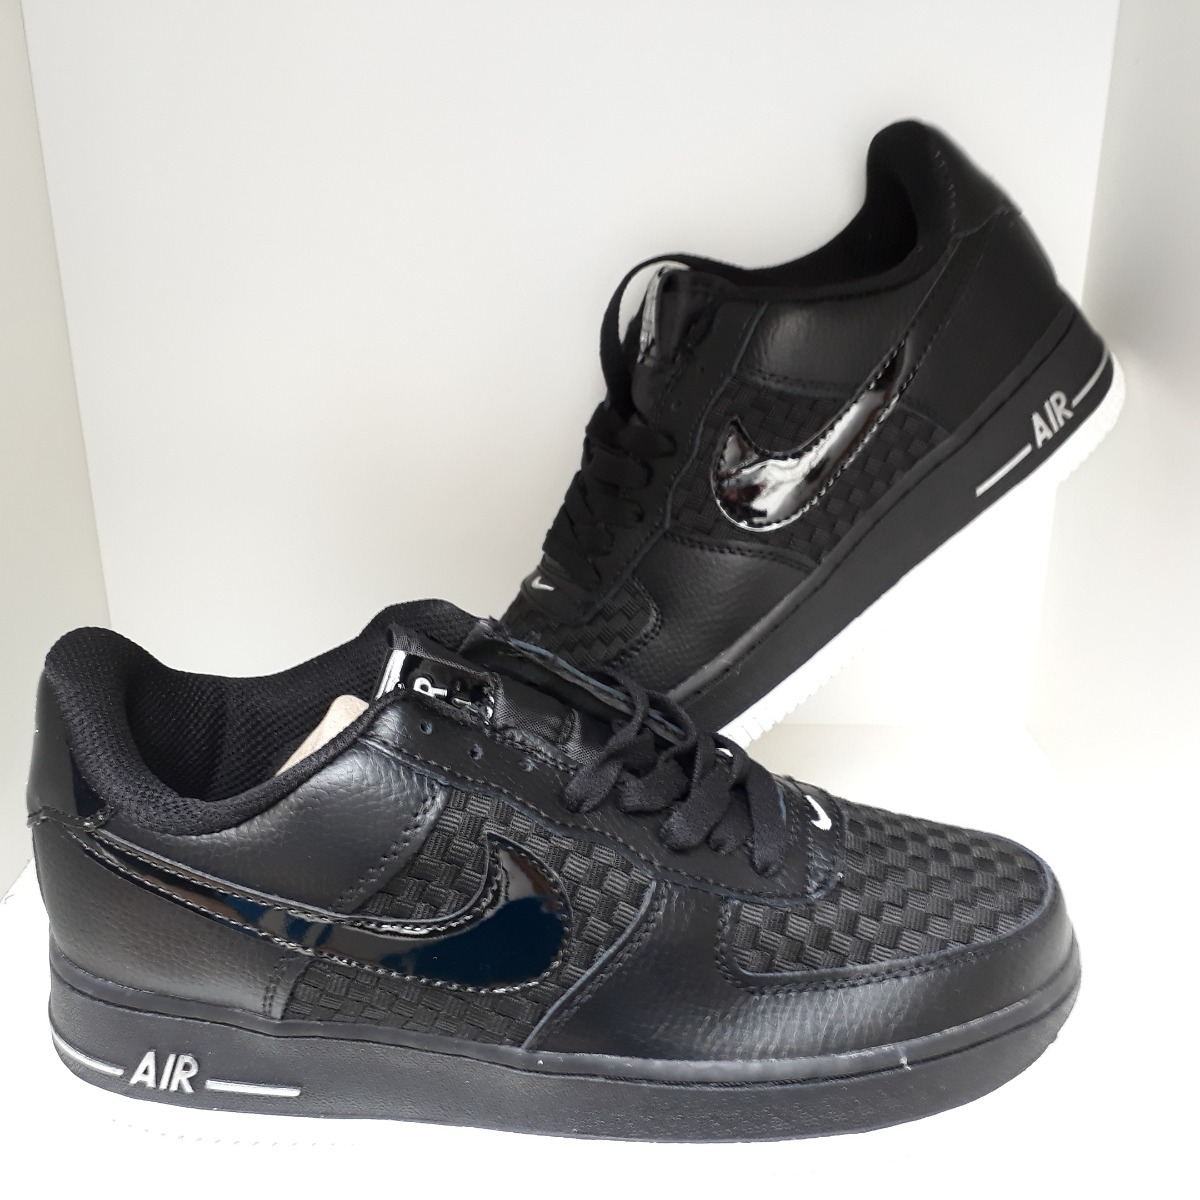 online store cbcdc 144f2 zapatillas nike air force hombre negras! Cargando zoom.